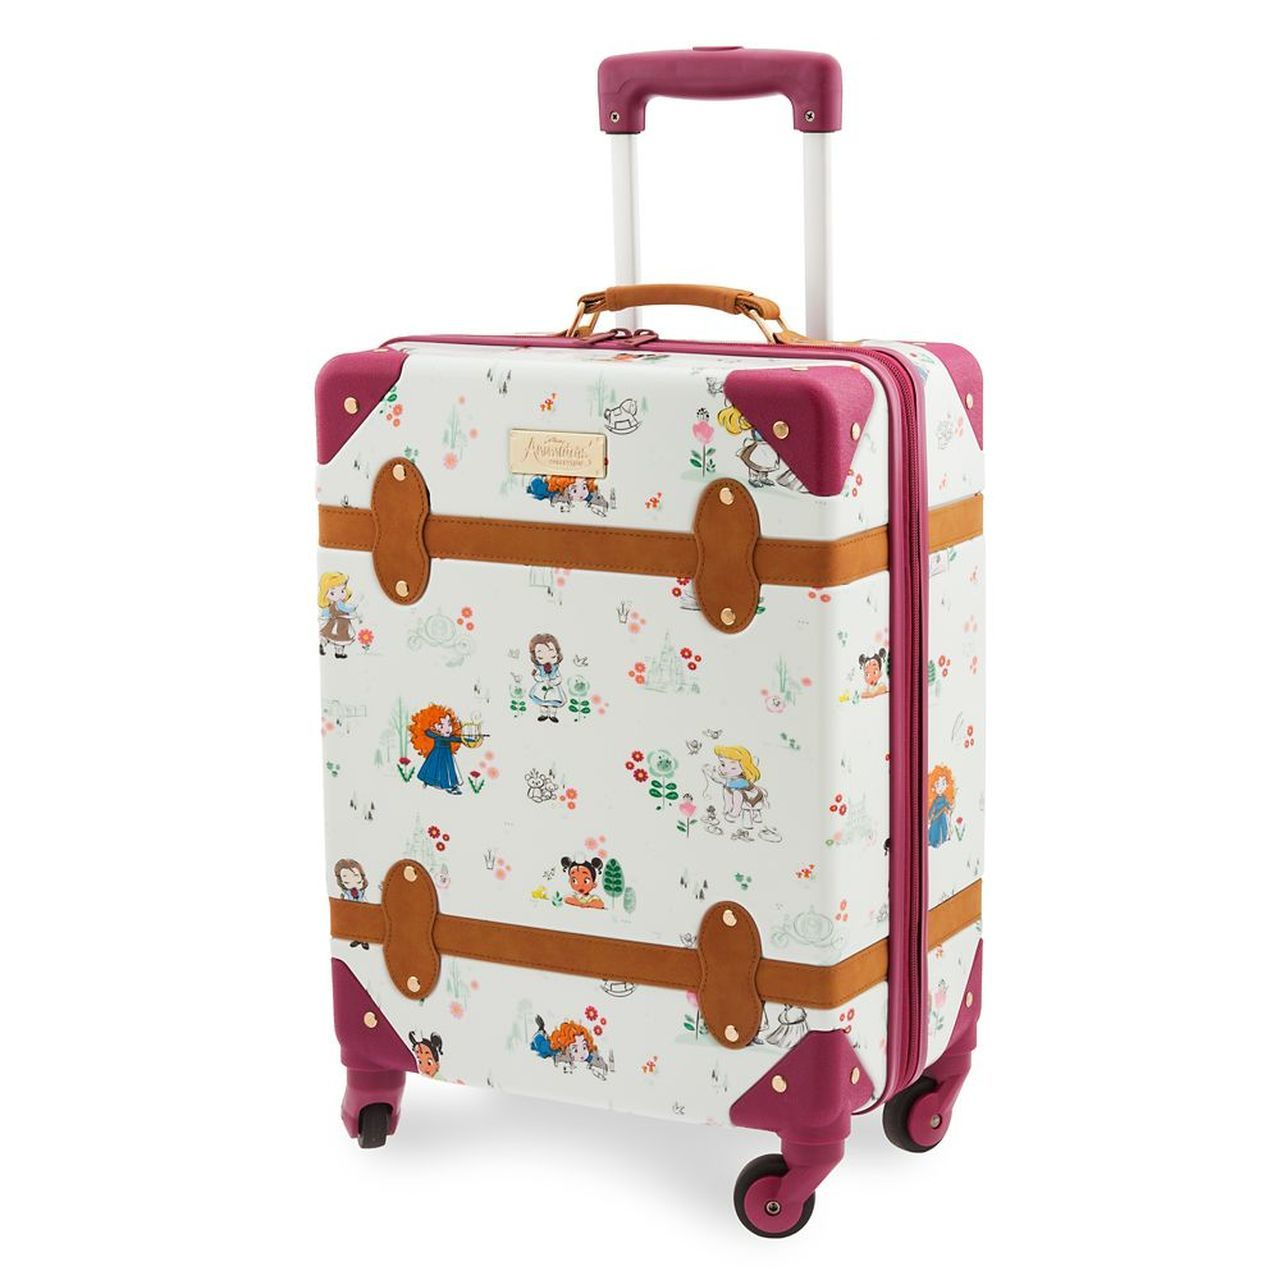 Disney Animators Collection Rolling Luggage Fogries Disney Animators Collection Disney Luggage Disney Suitcase